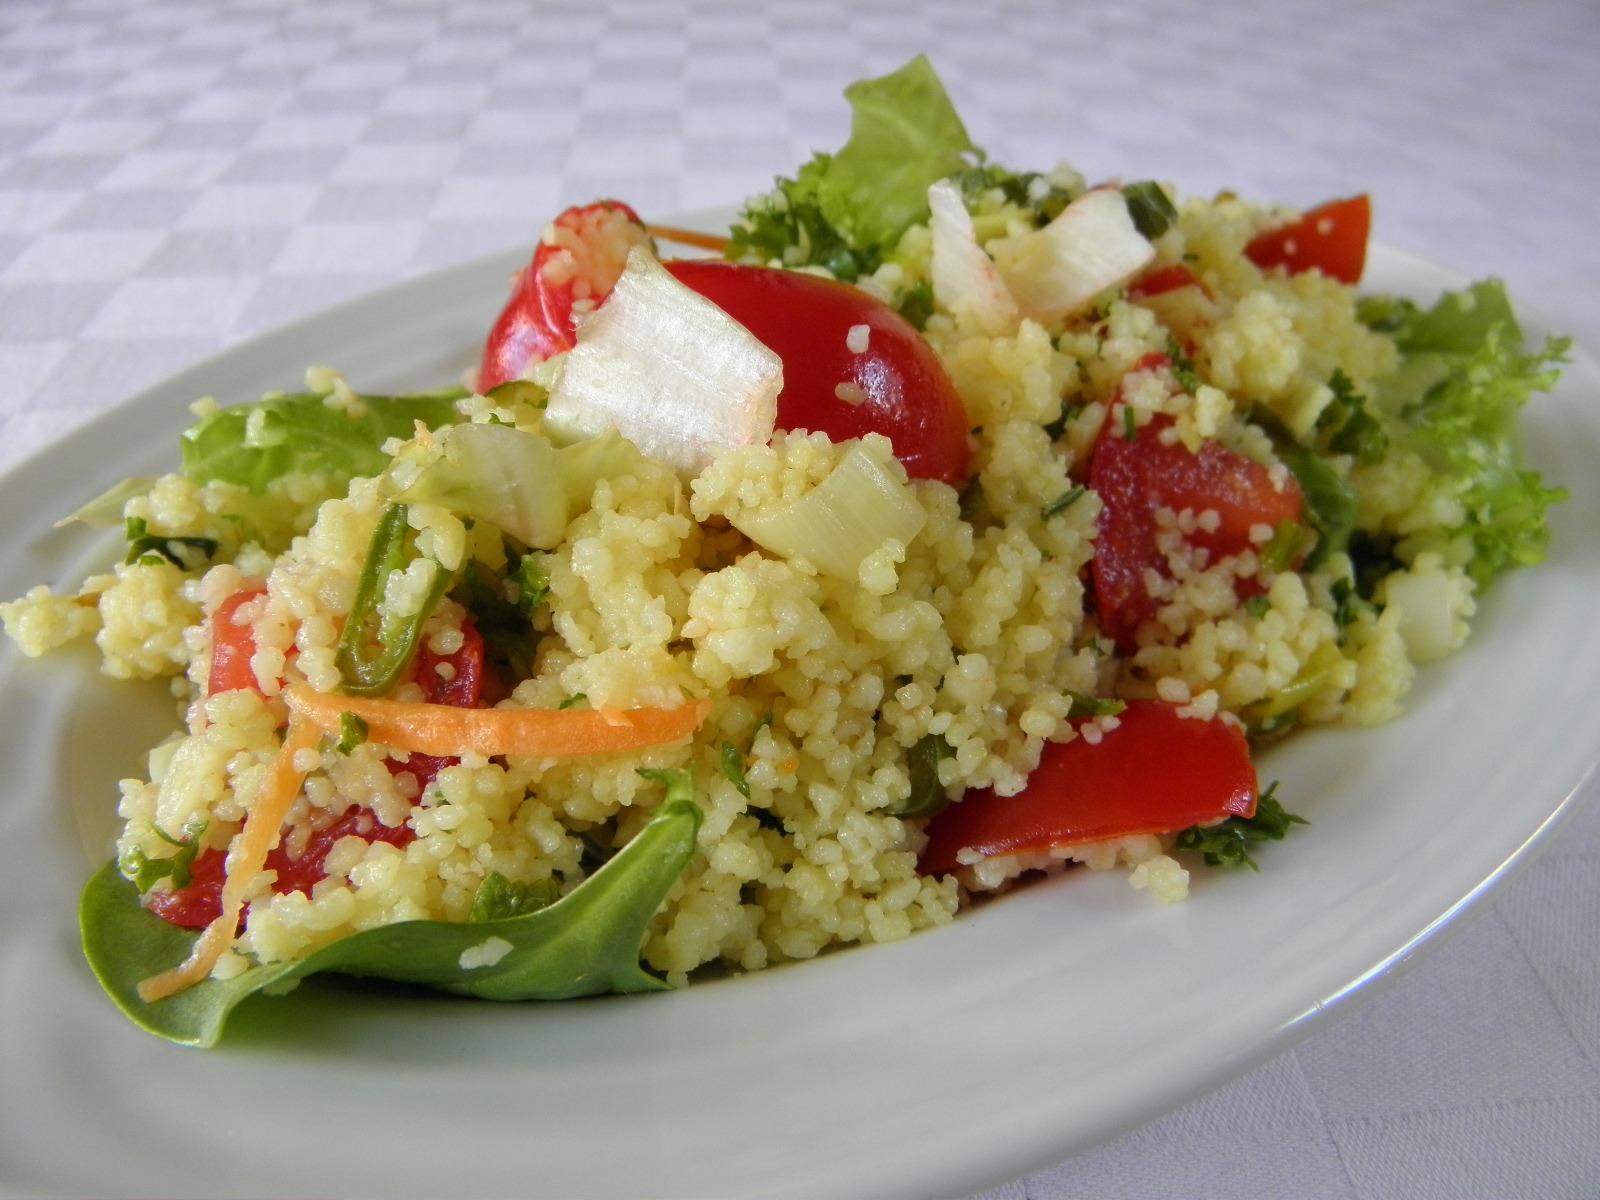 Fotografie receptu: Salát z kuskusu a zeleniny